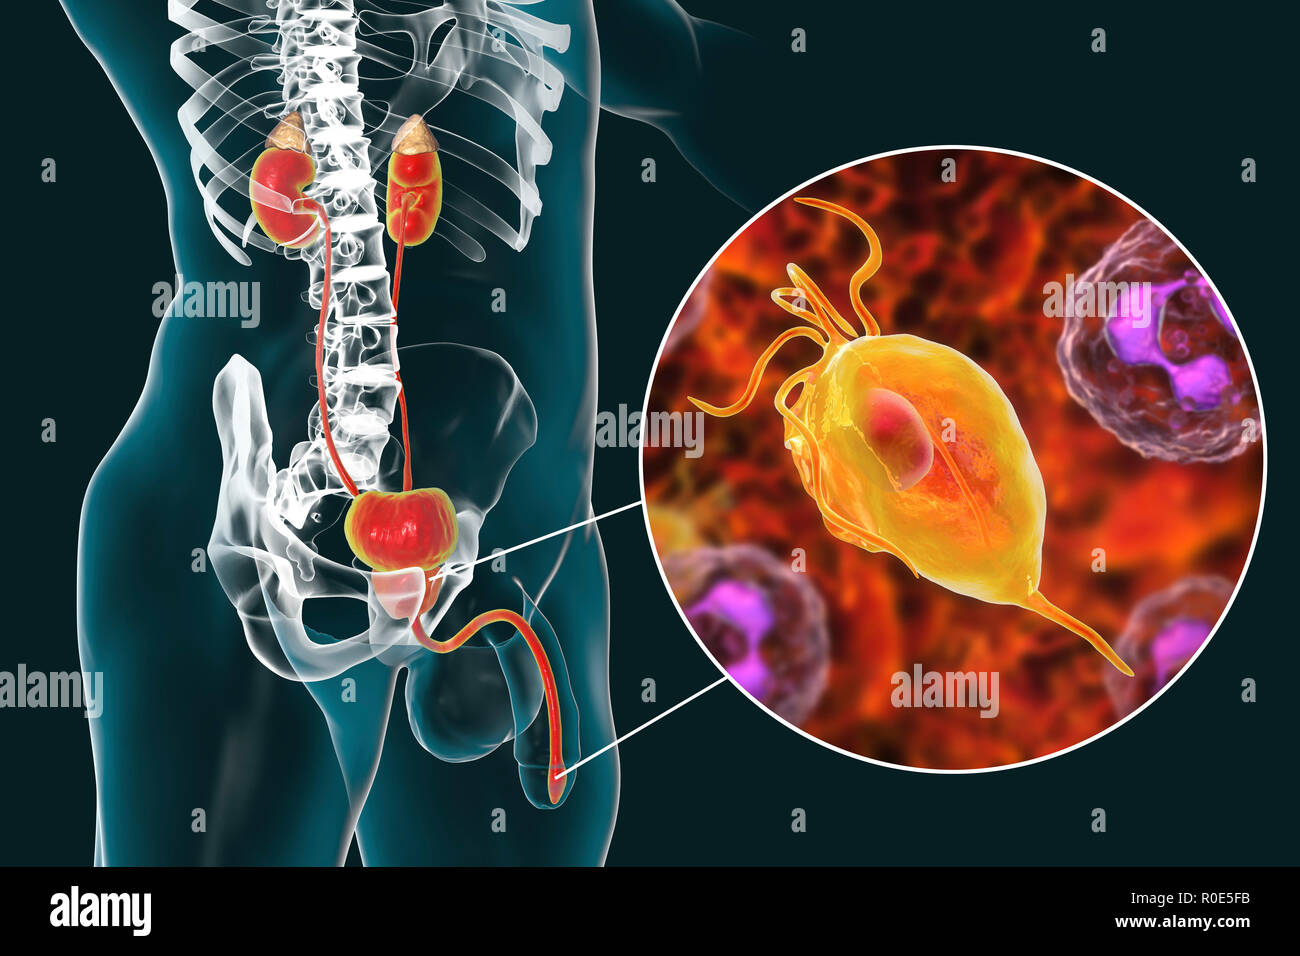 Prostatitis Stock Photos & Prostatitis Stock Images - Alamy